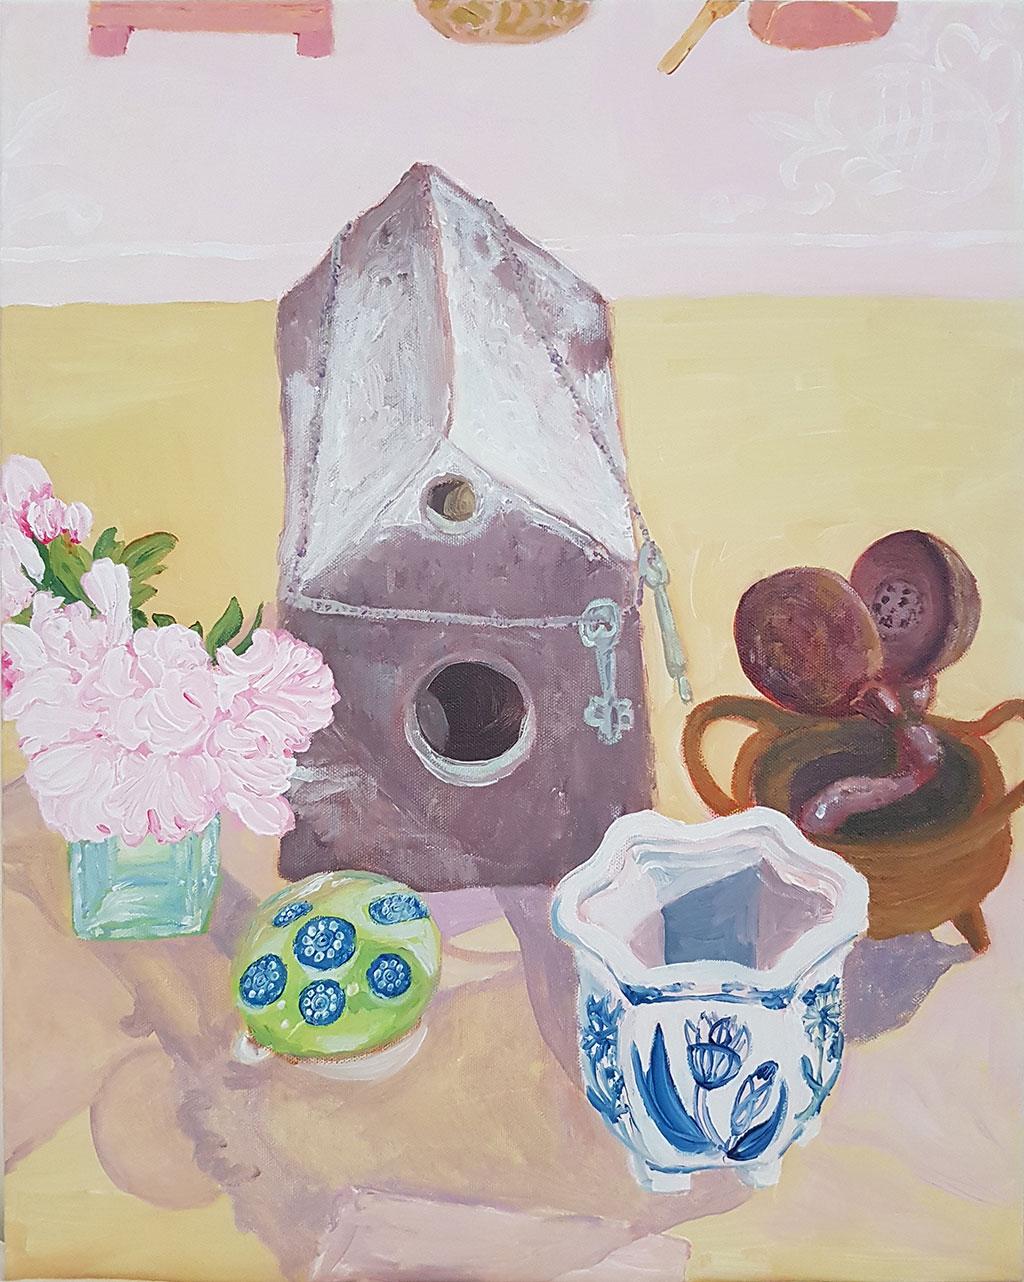 12.-Judi's-Clay-Bird-House-40.7-x-50.9cm-$815